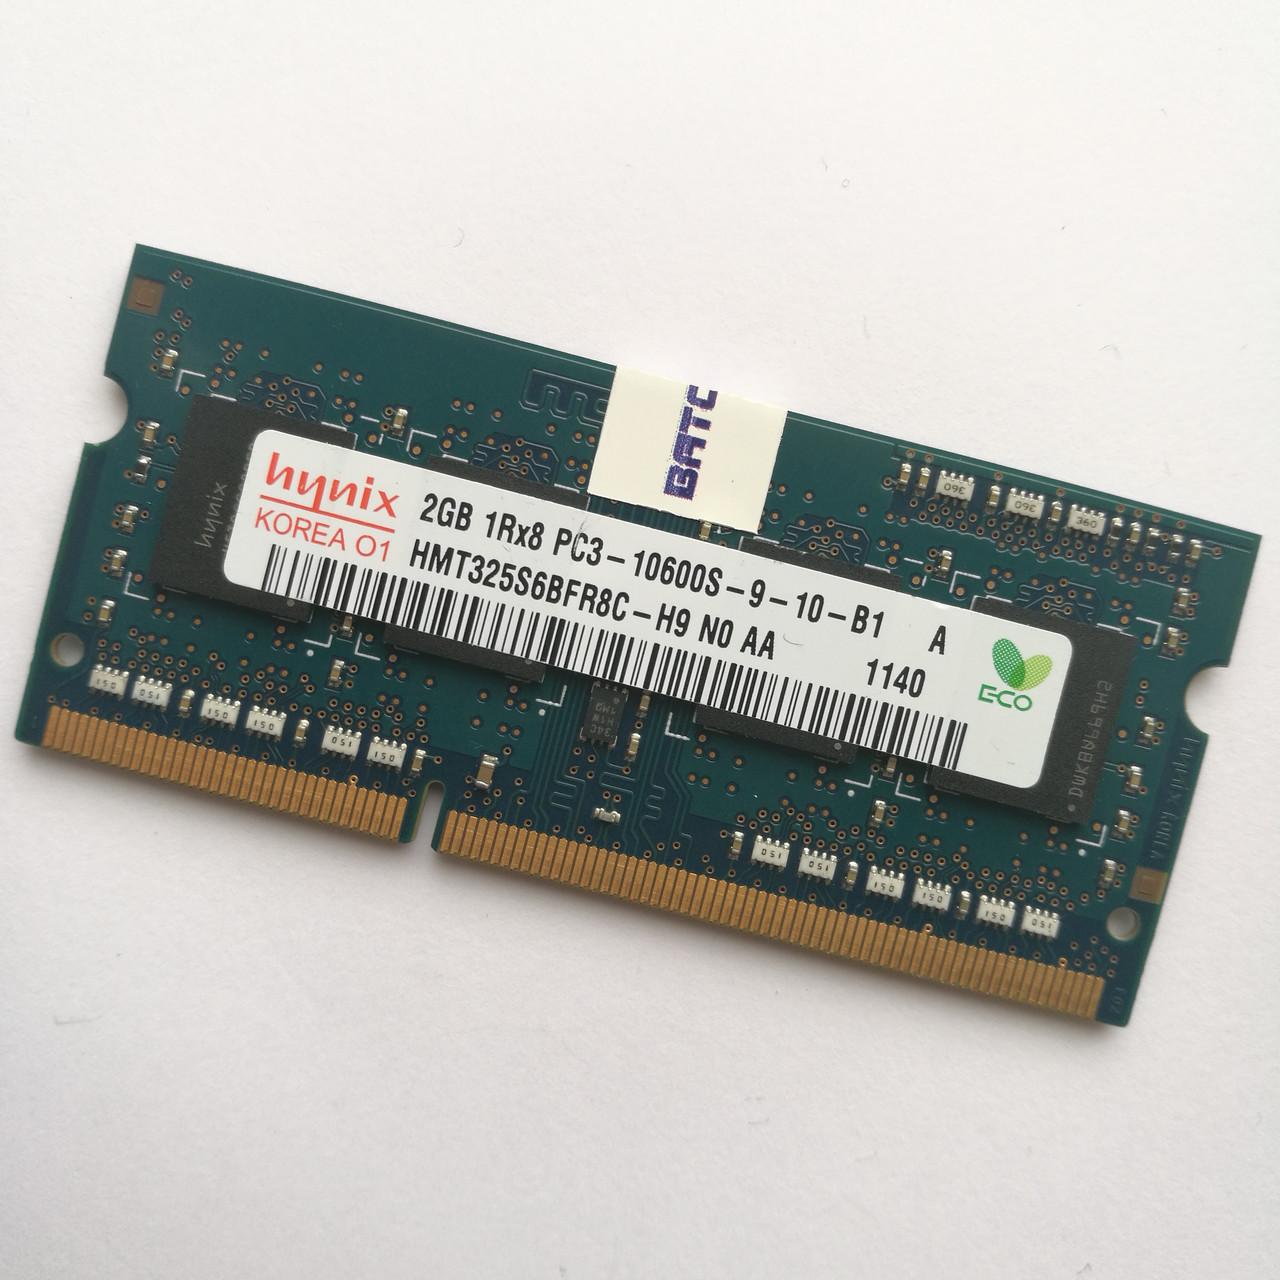 Оперативная память для ноутбука Hynix SODIMM DDR3 2Gb 1333MHz 10600s (HMT325S6BFR8C-H9 N0 AA) Б/У